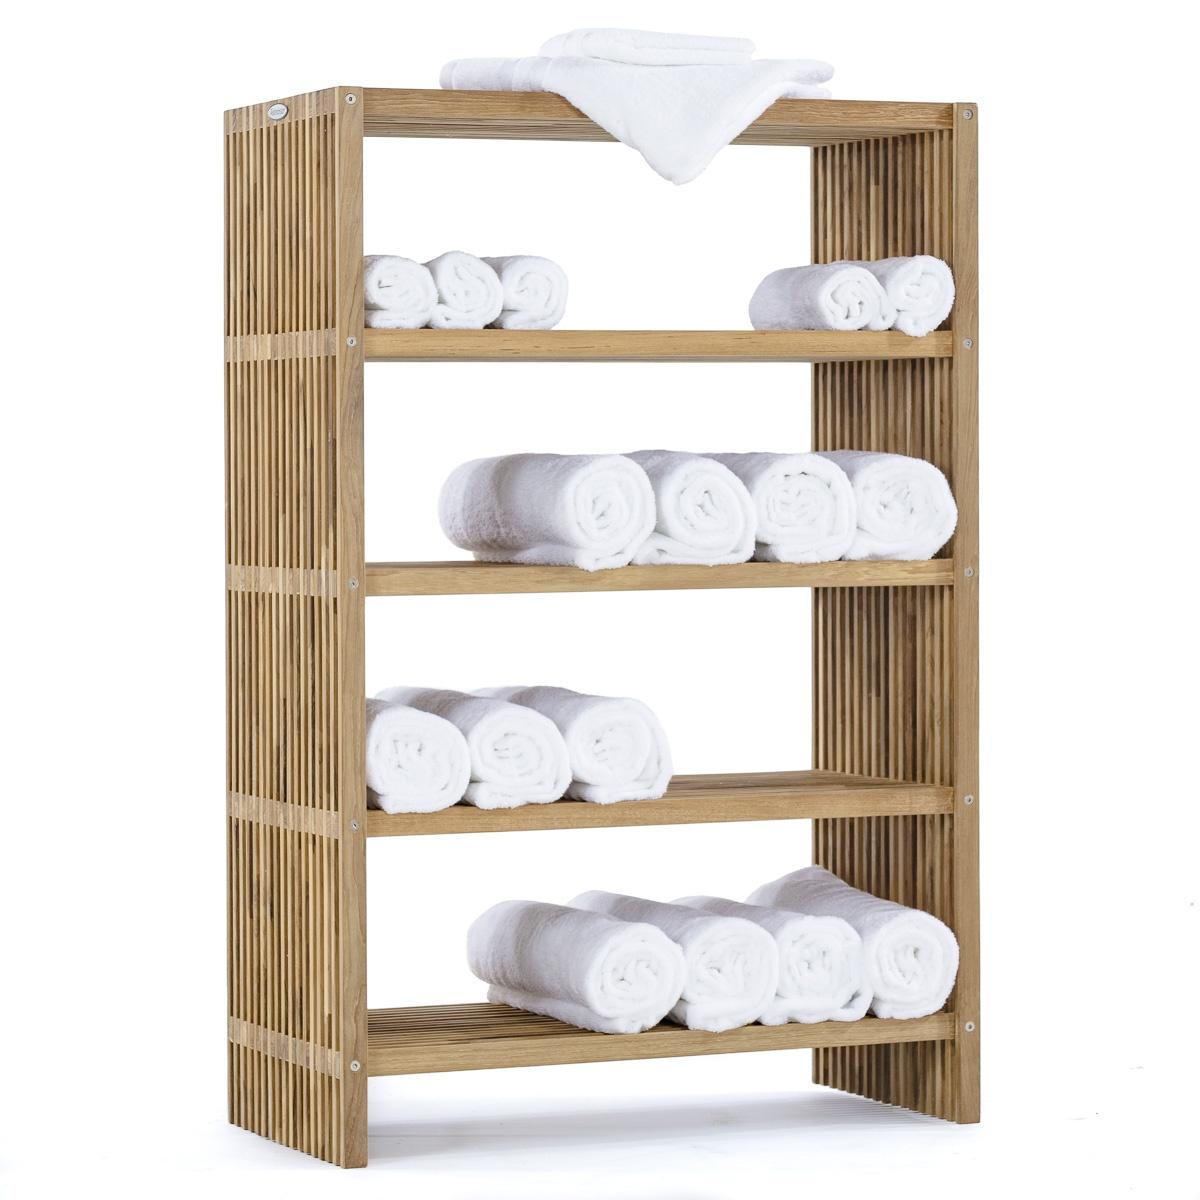 Westminster Teak Free Standing Towel Shelf And Rac